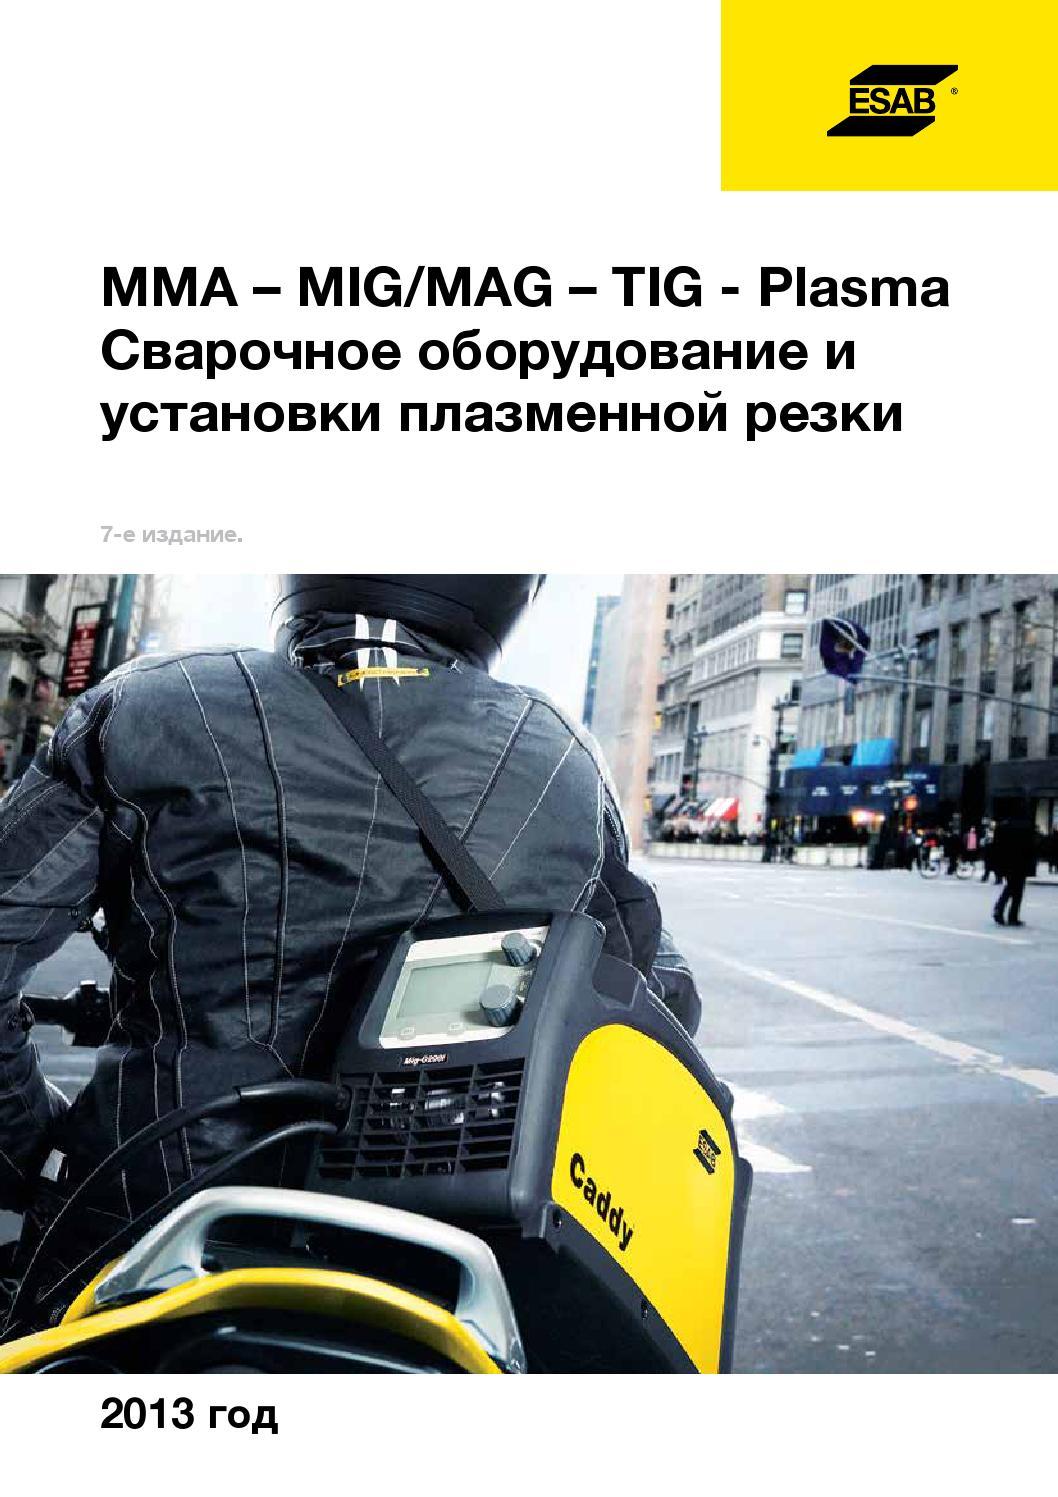 caddy tig 2200i ac dc инструкция на панель управления ta33 ac dc a